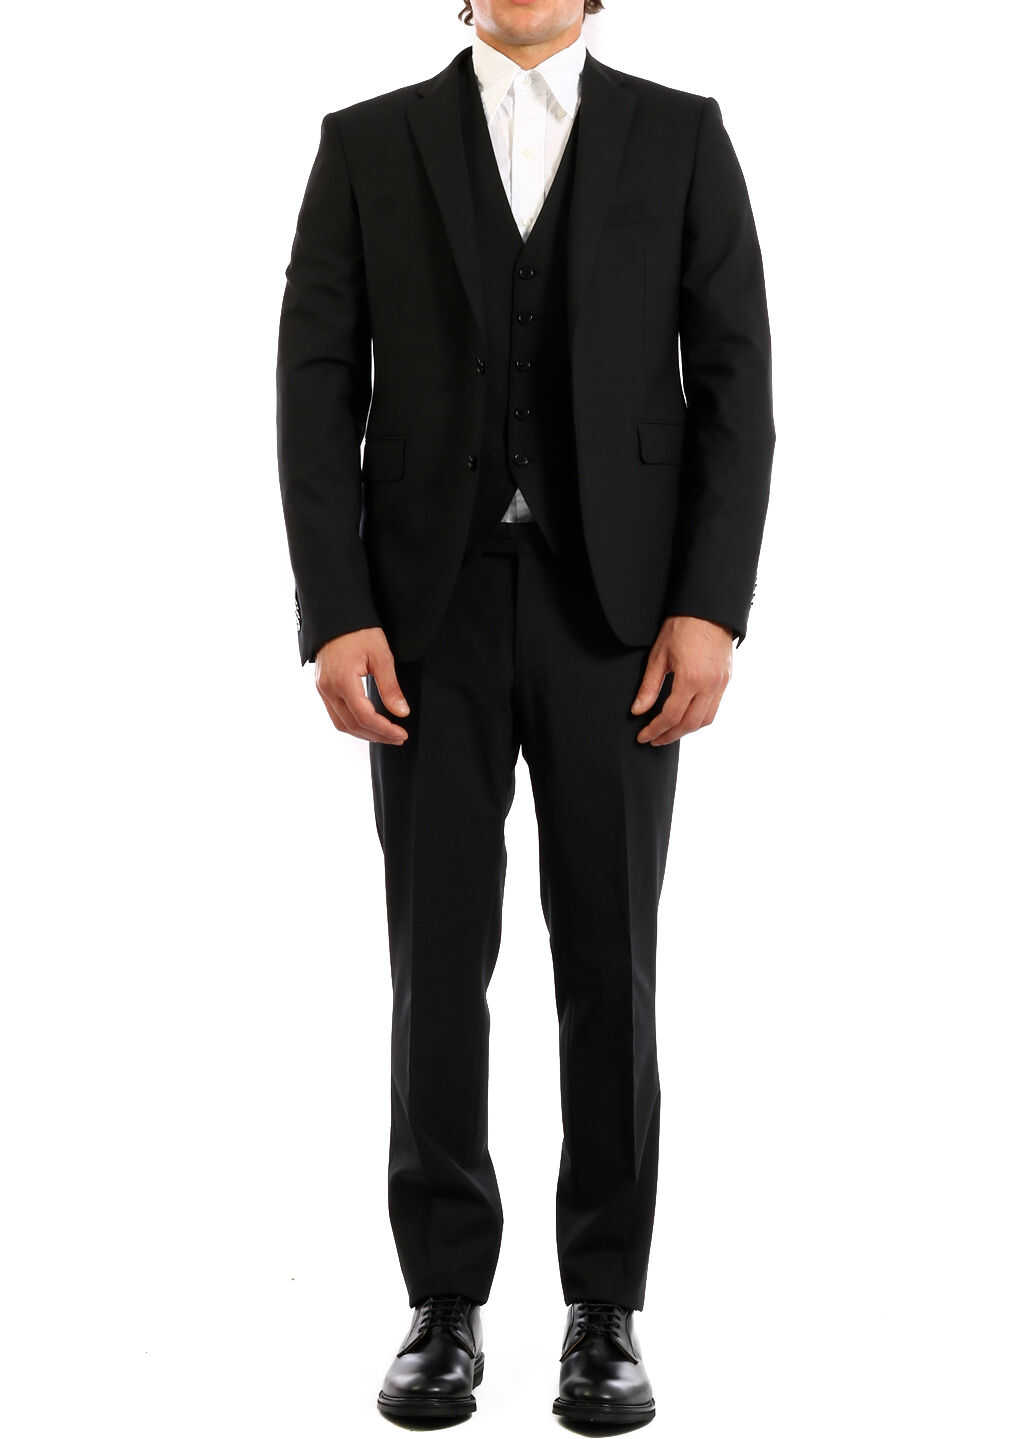 Tagliatore Three-Piece Suit In Wool Black imagine